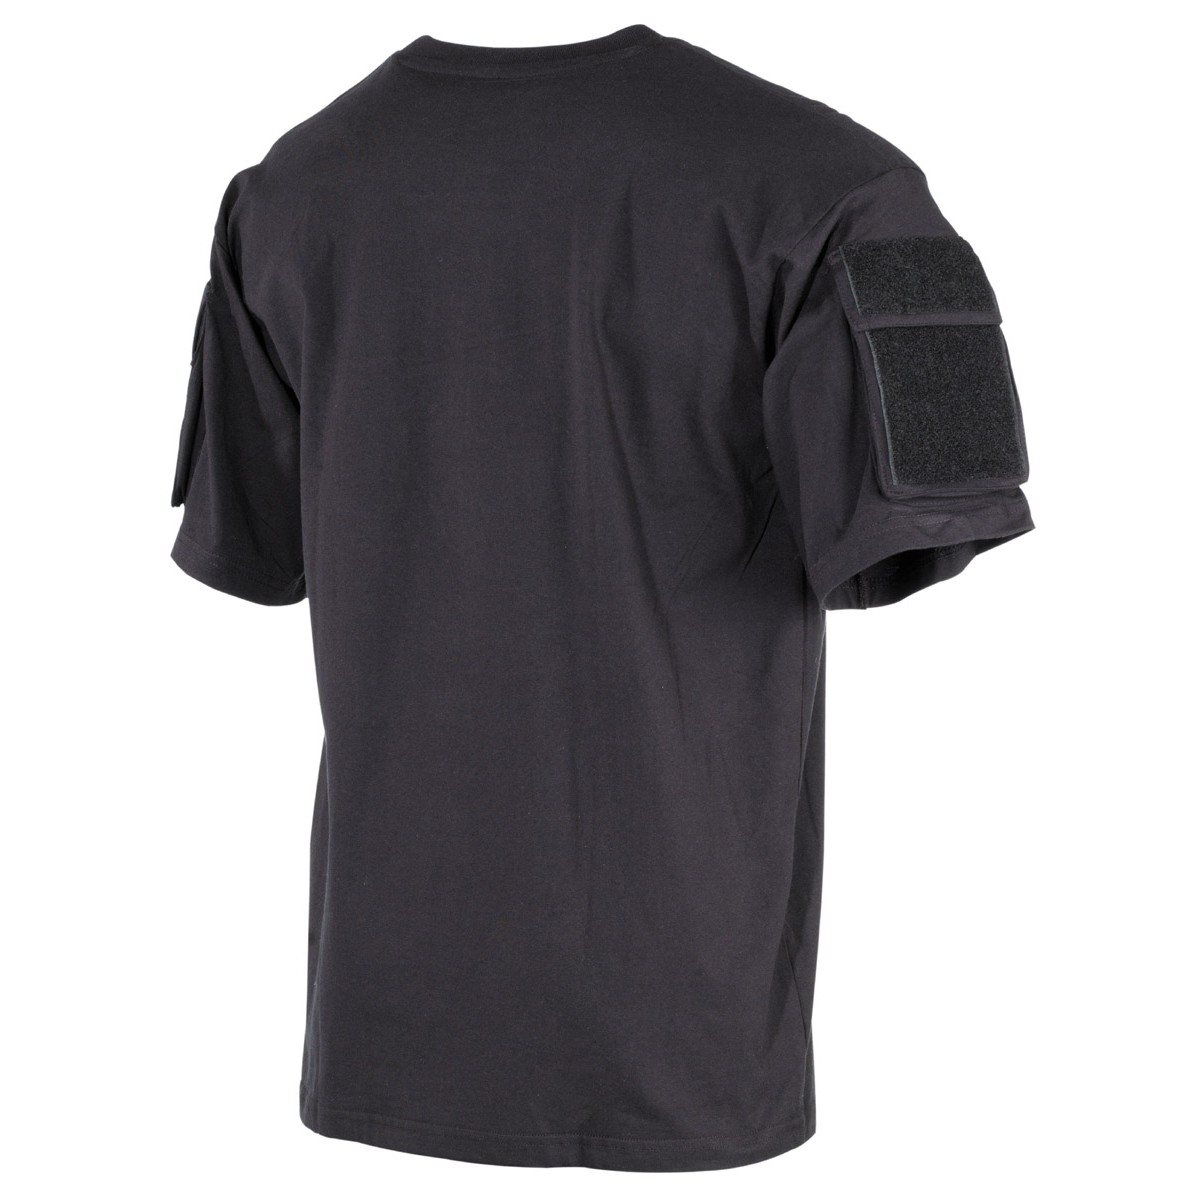 US T-shirt VELRCO BLACK MFH int. comp. 00121A L-11